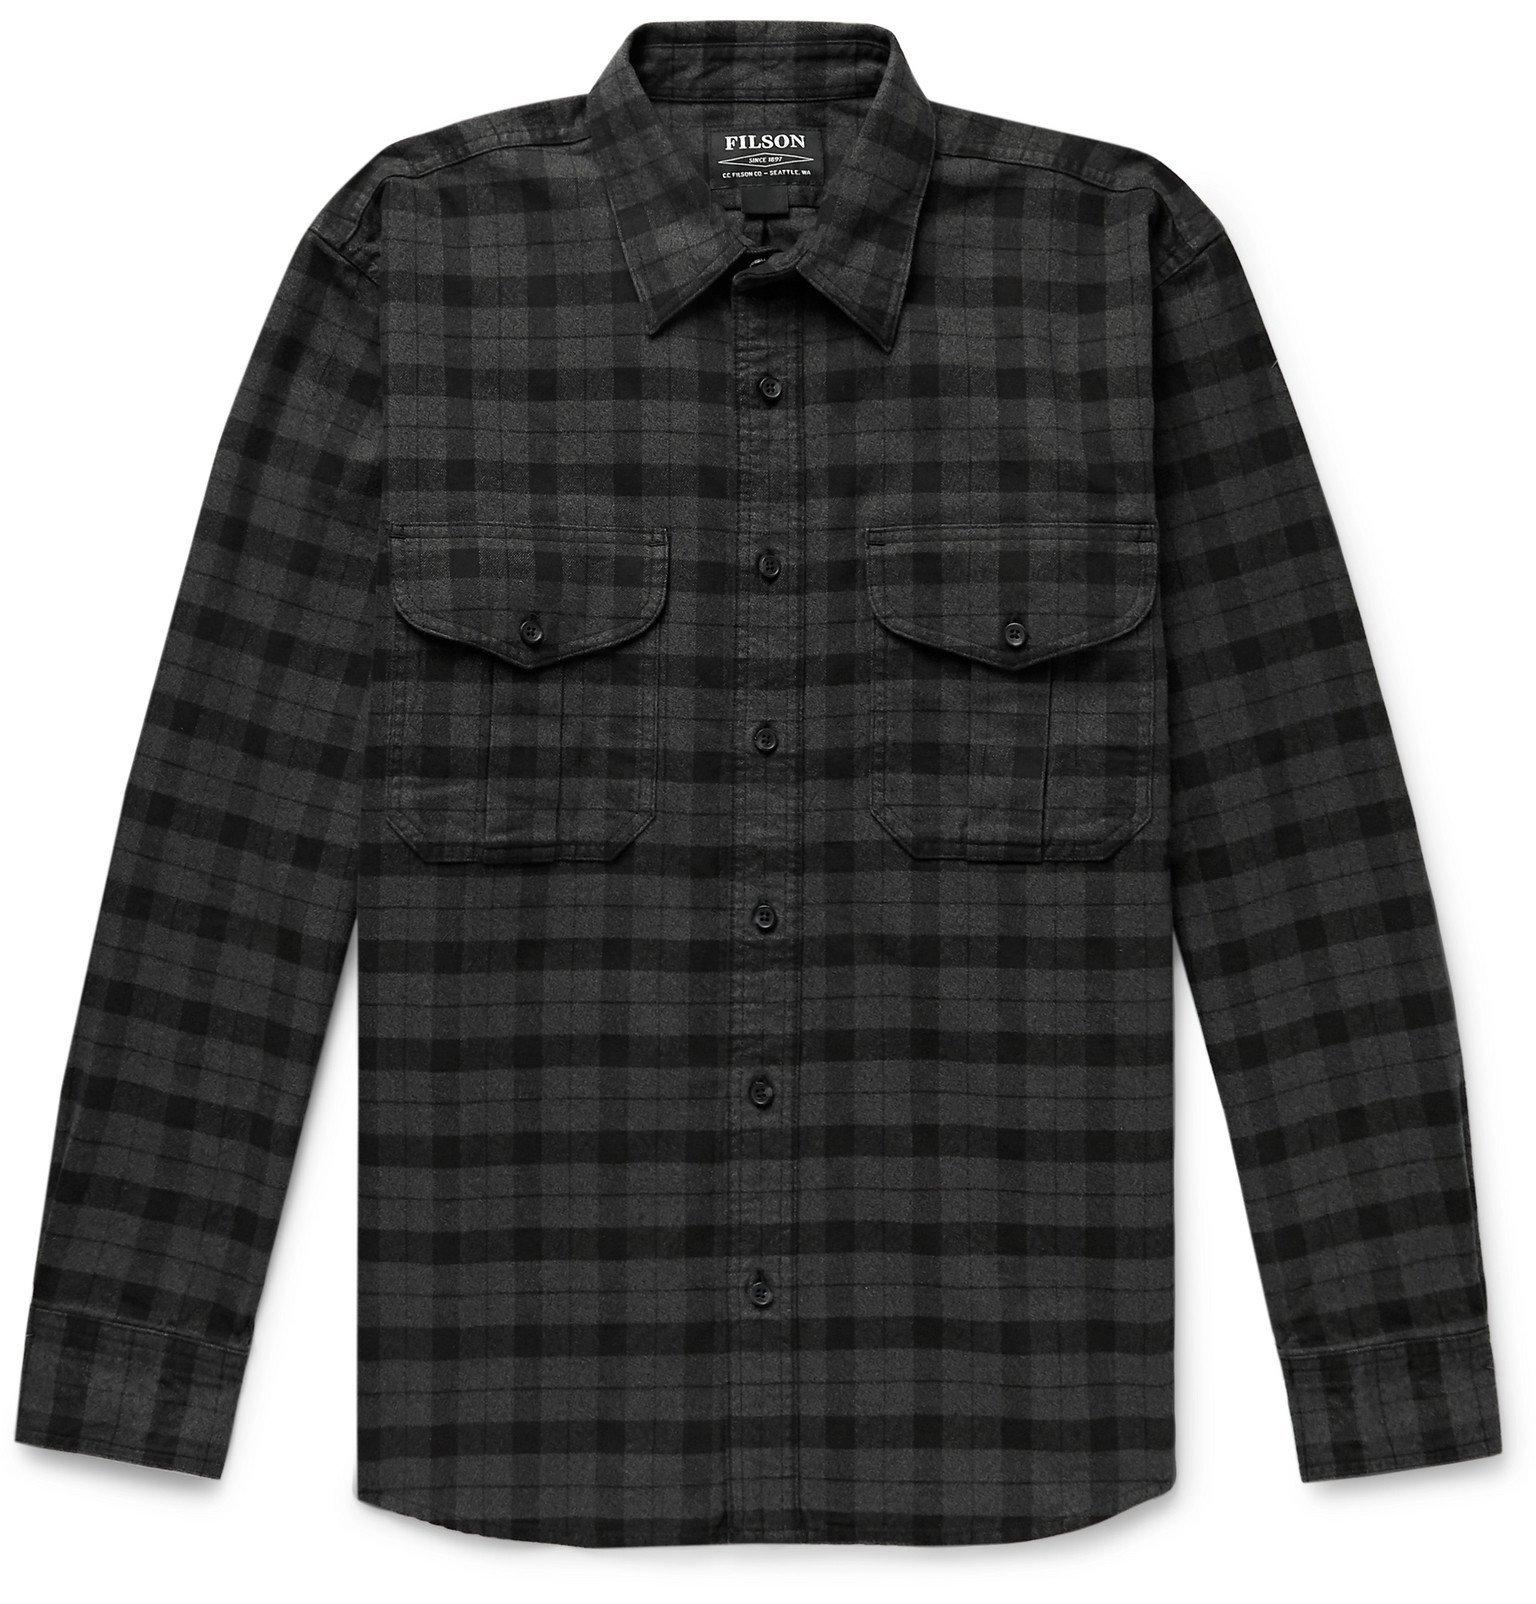 Filson - Alaskan Guide Checked Cotton-Flannel Shirt - Black